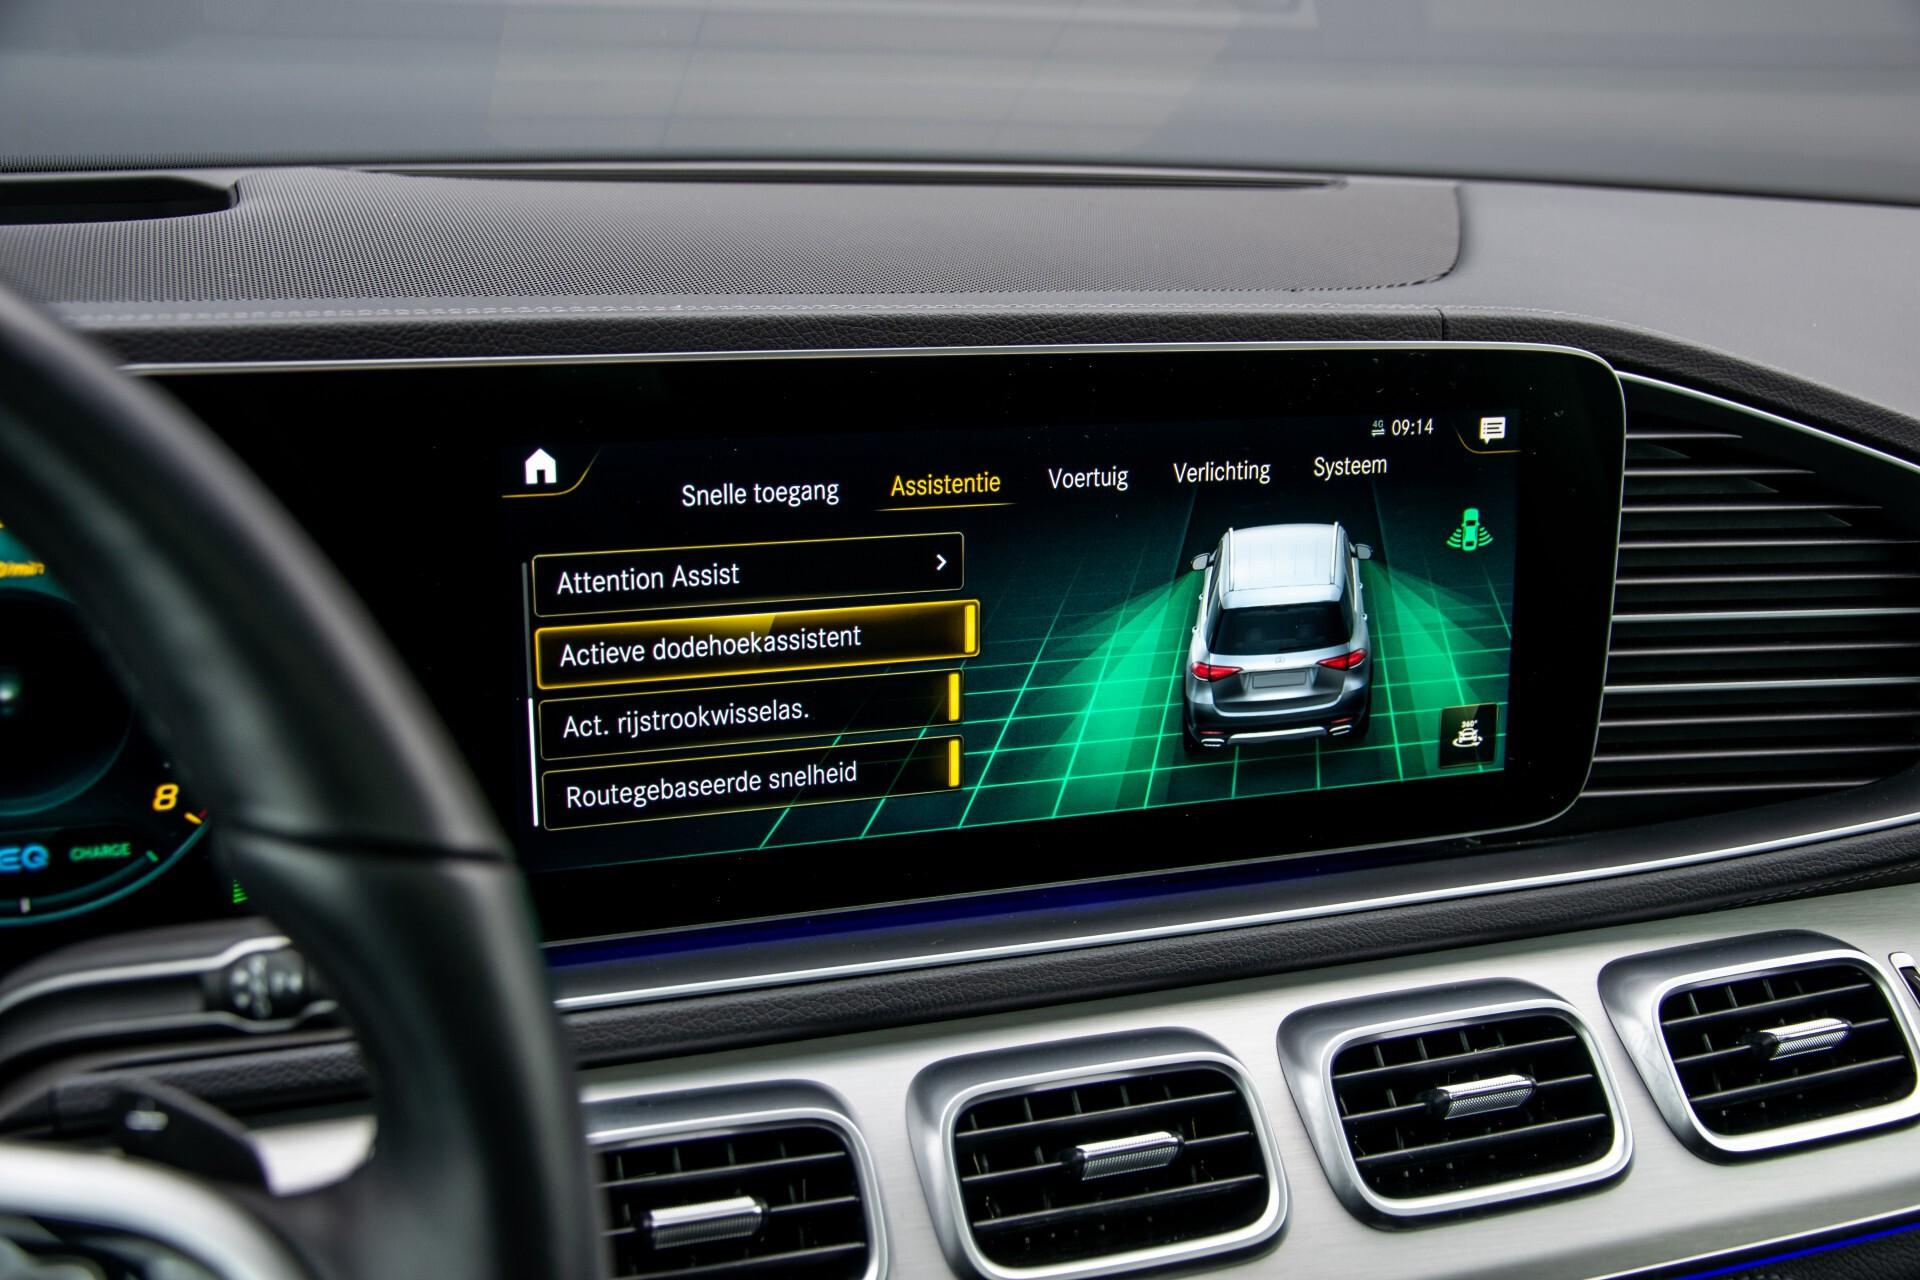 Mercedes-Benz GLE 450 4-M 7-Persoons AMG Massage/Rij-assist/Keyless/TV/360/Night/Trekhaak Aut9 Foto 36